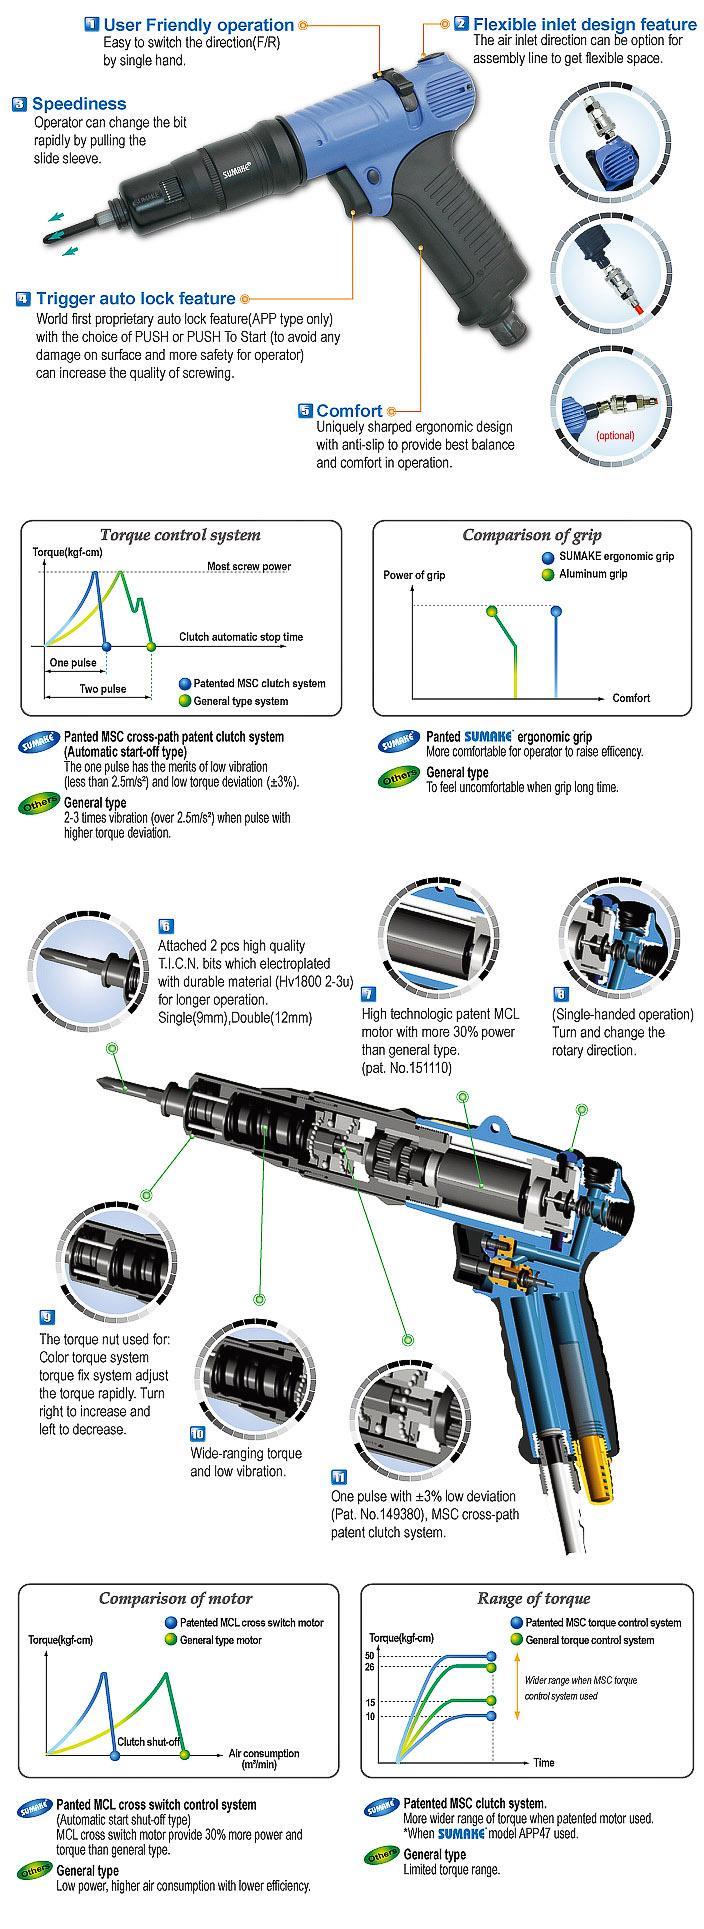 Auto Shut-off Clutch Air Screwdriver FP110 Push to Start 26-95 in lbs